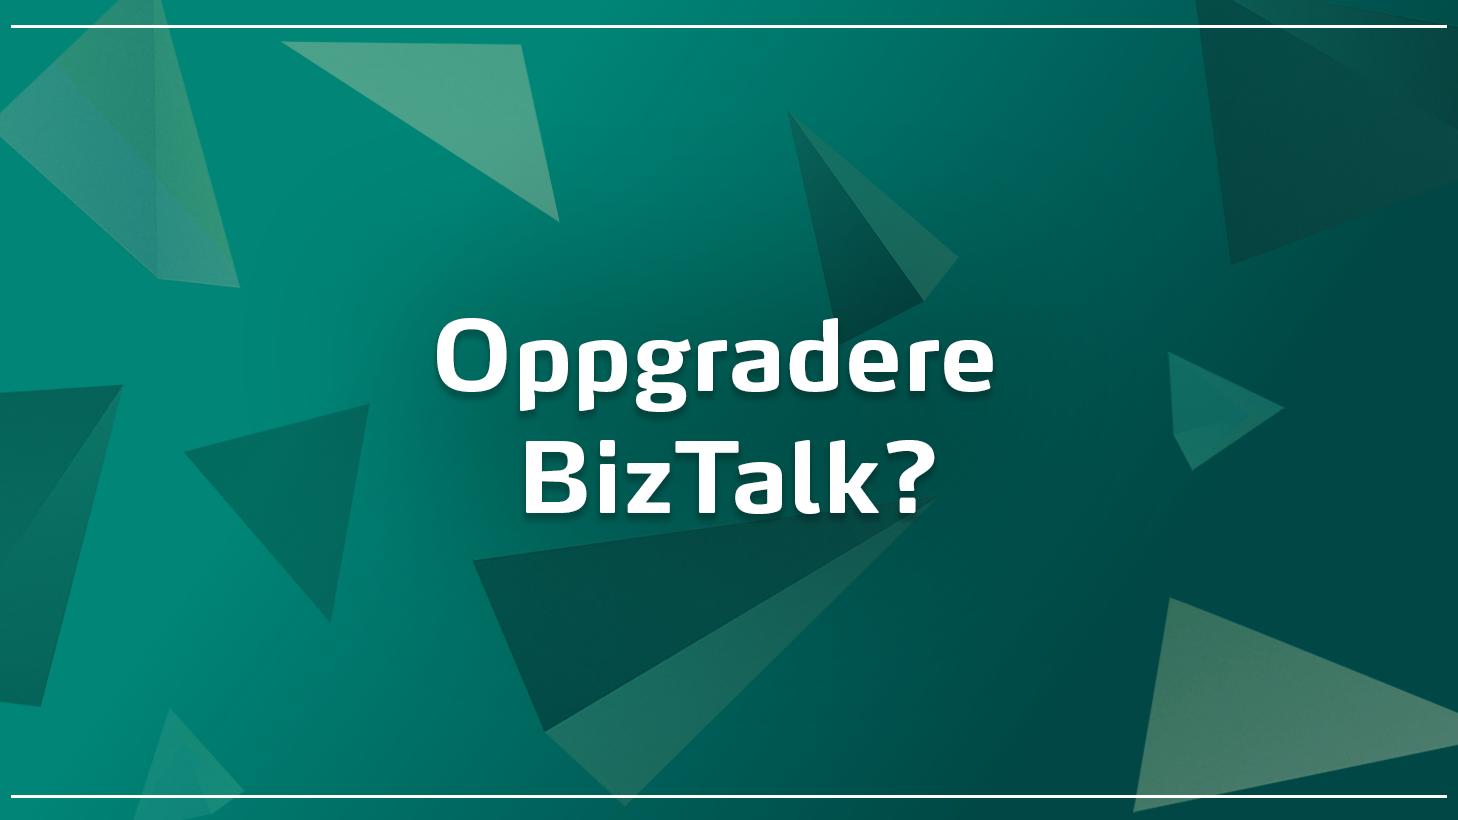 Oppgradere BizTalk thumbnail